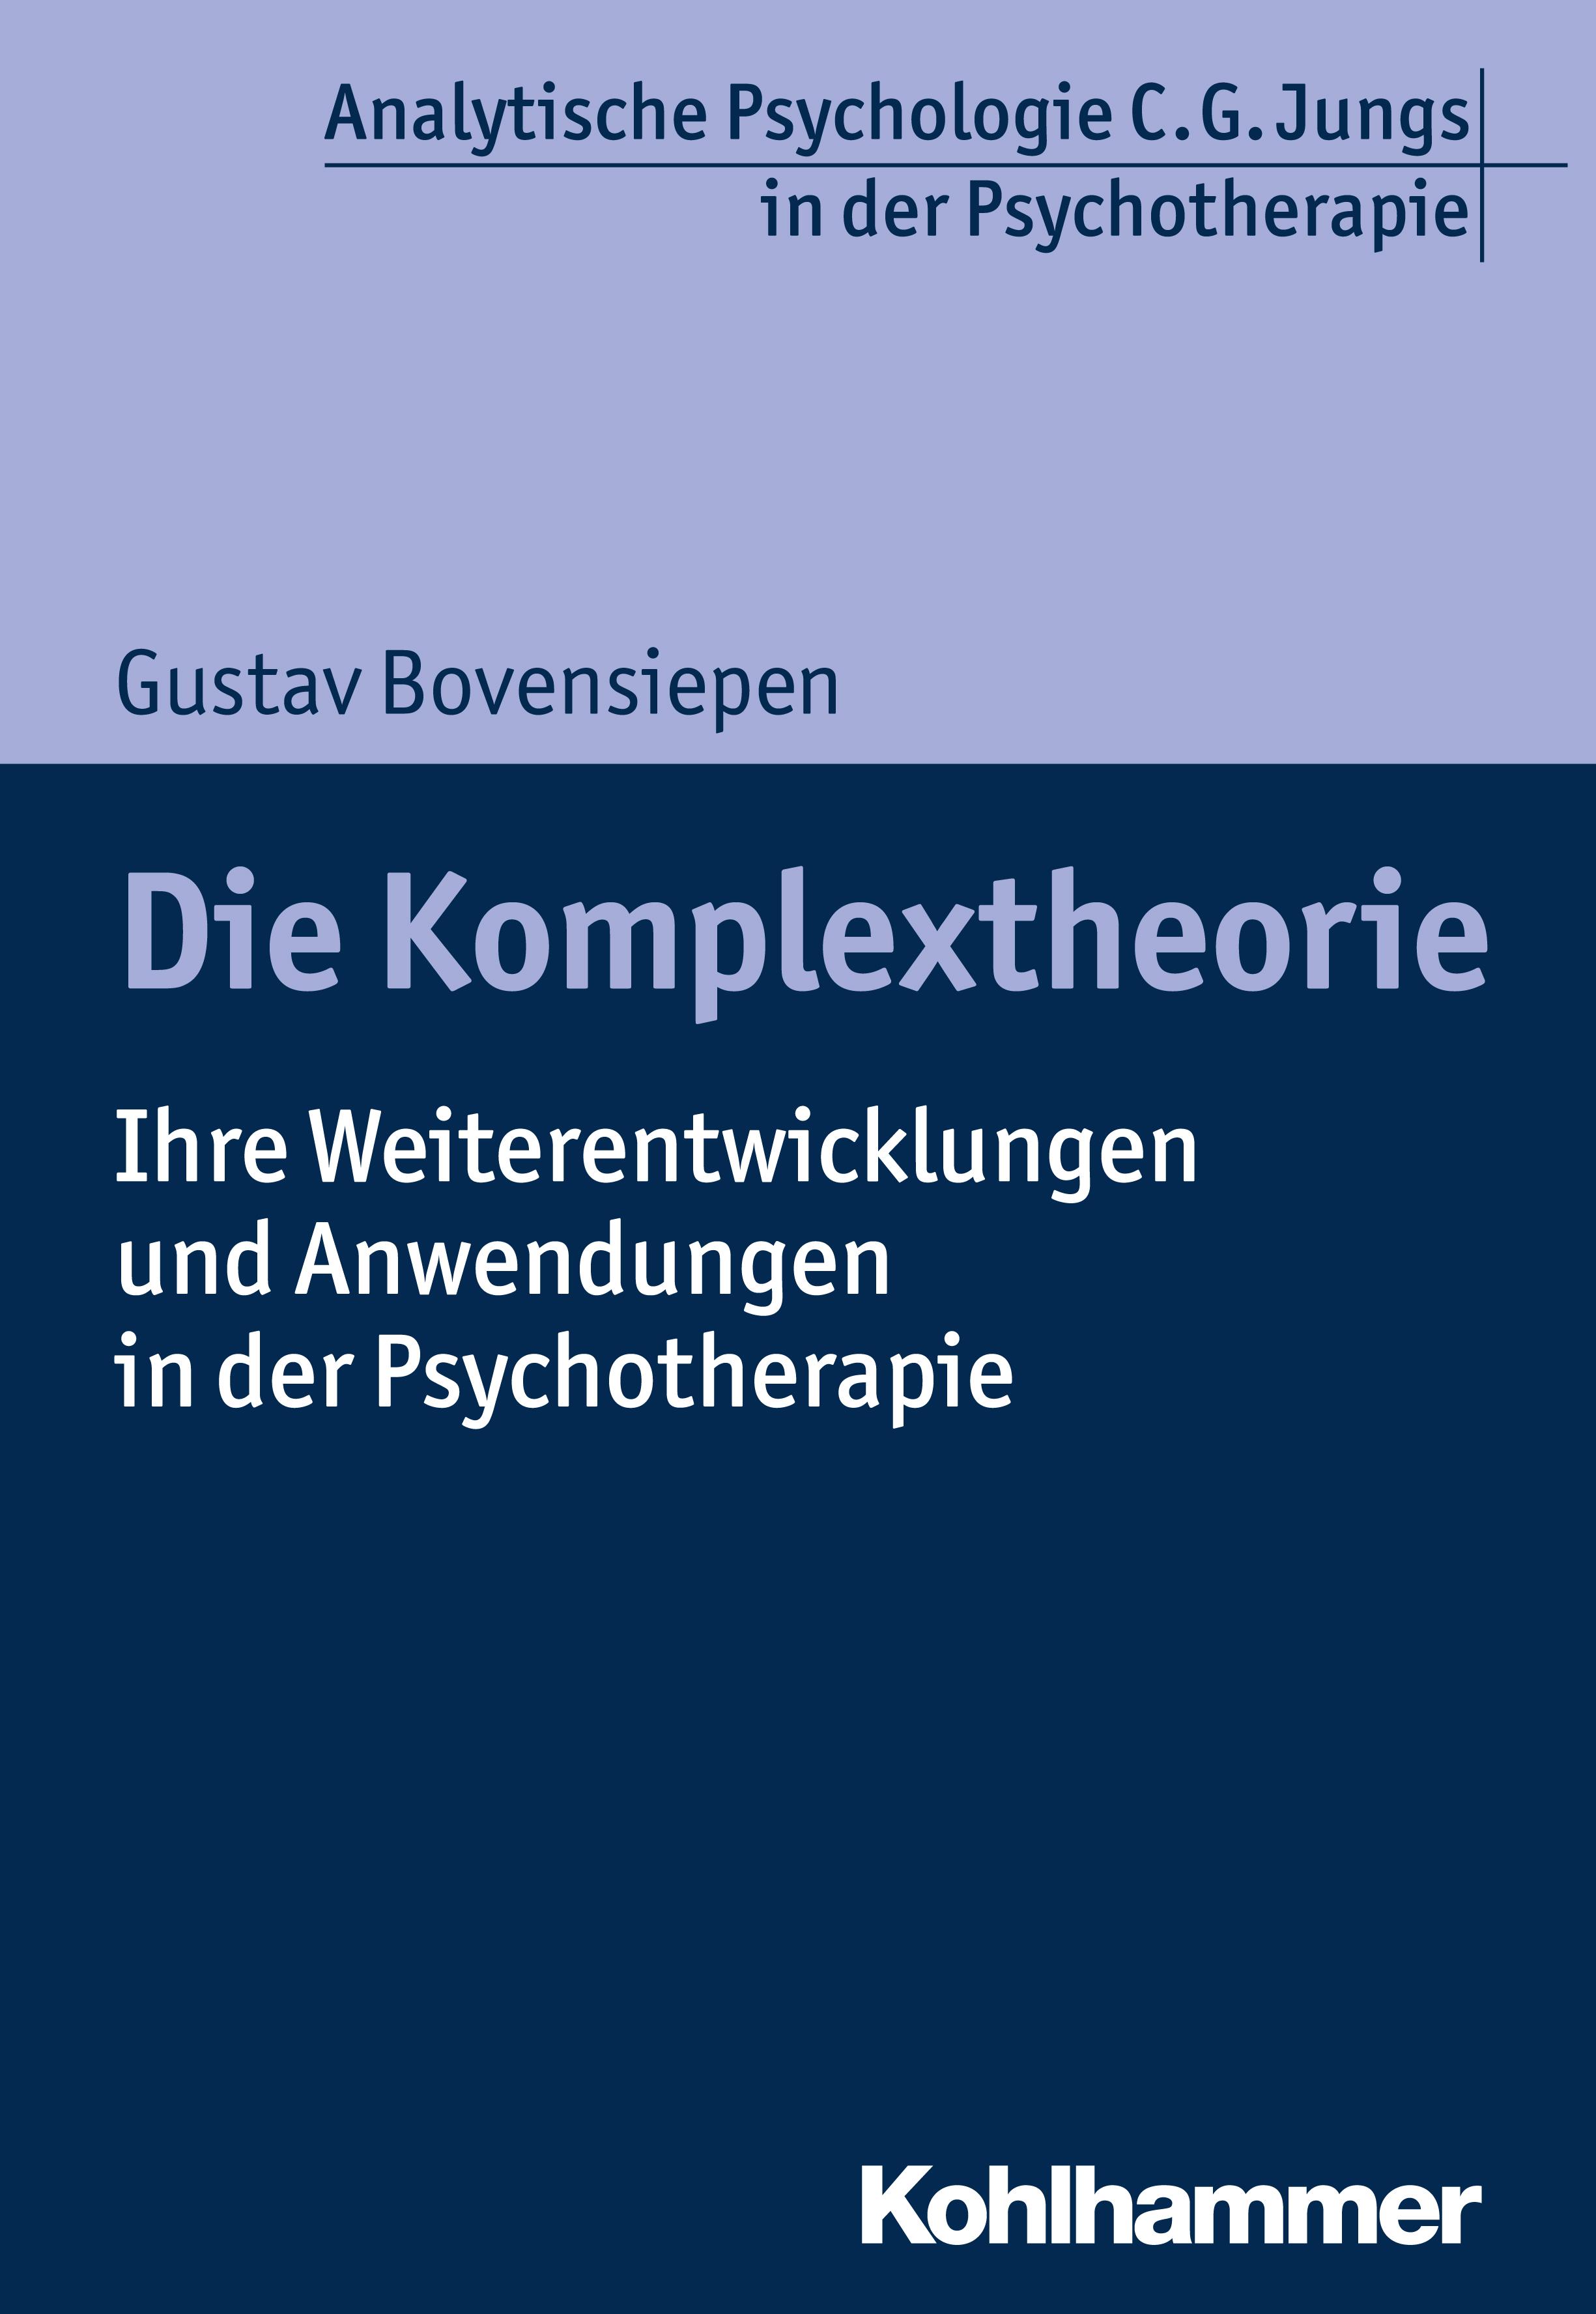 Фото - Gustav Bovensiepen Die Komplextheorie gustav parthey mirabilia romae e codicibvs vaticanis emendata